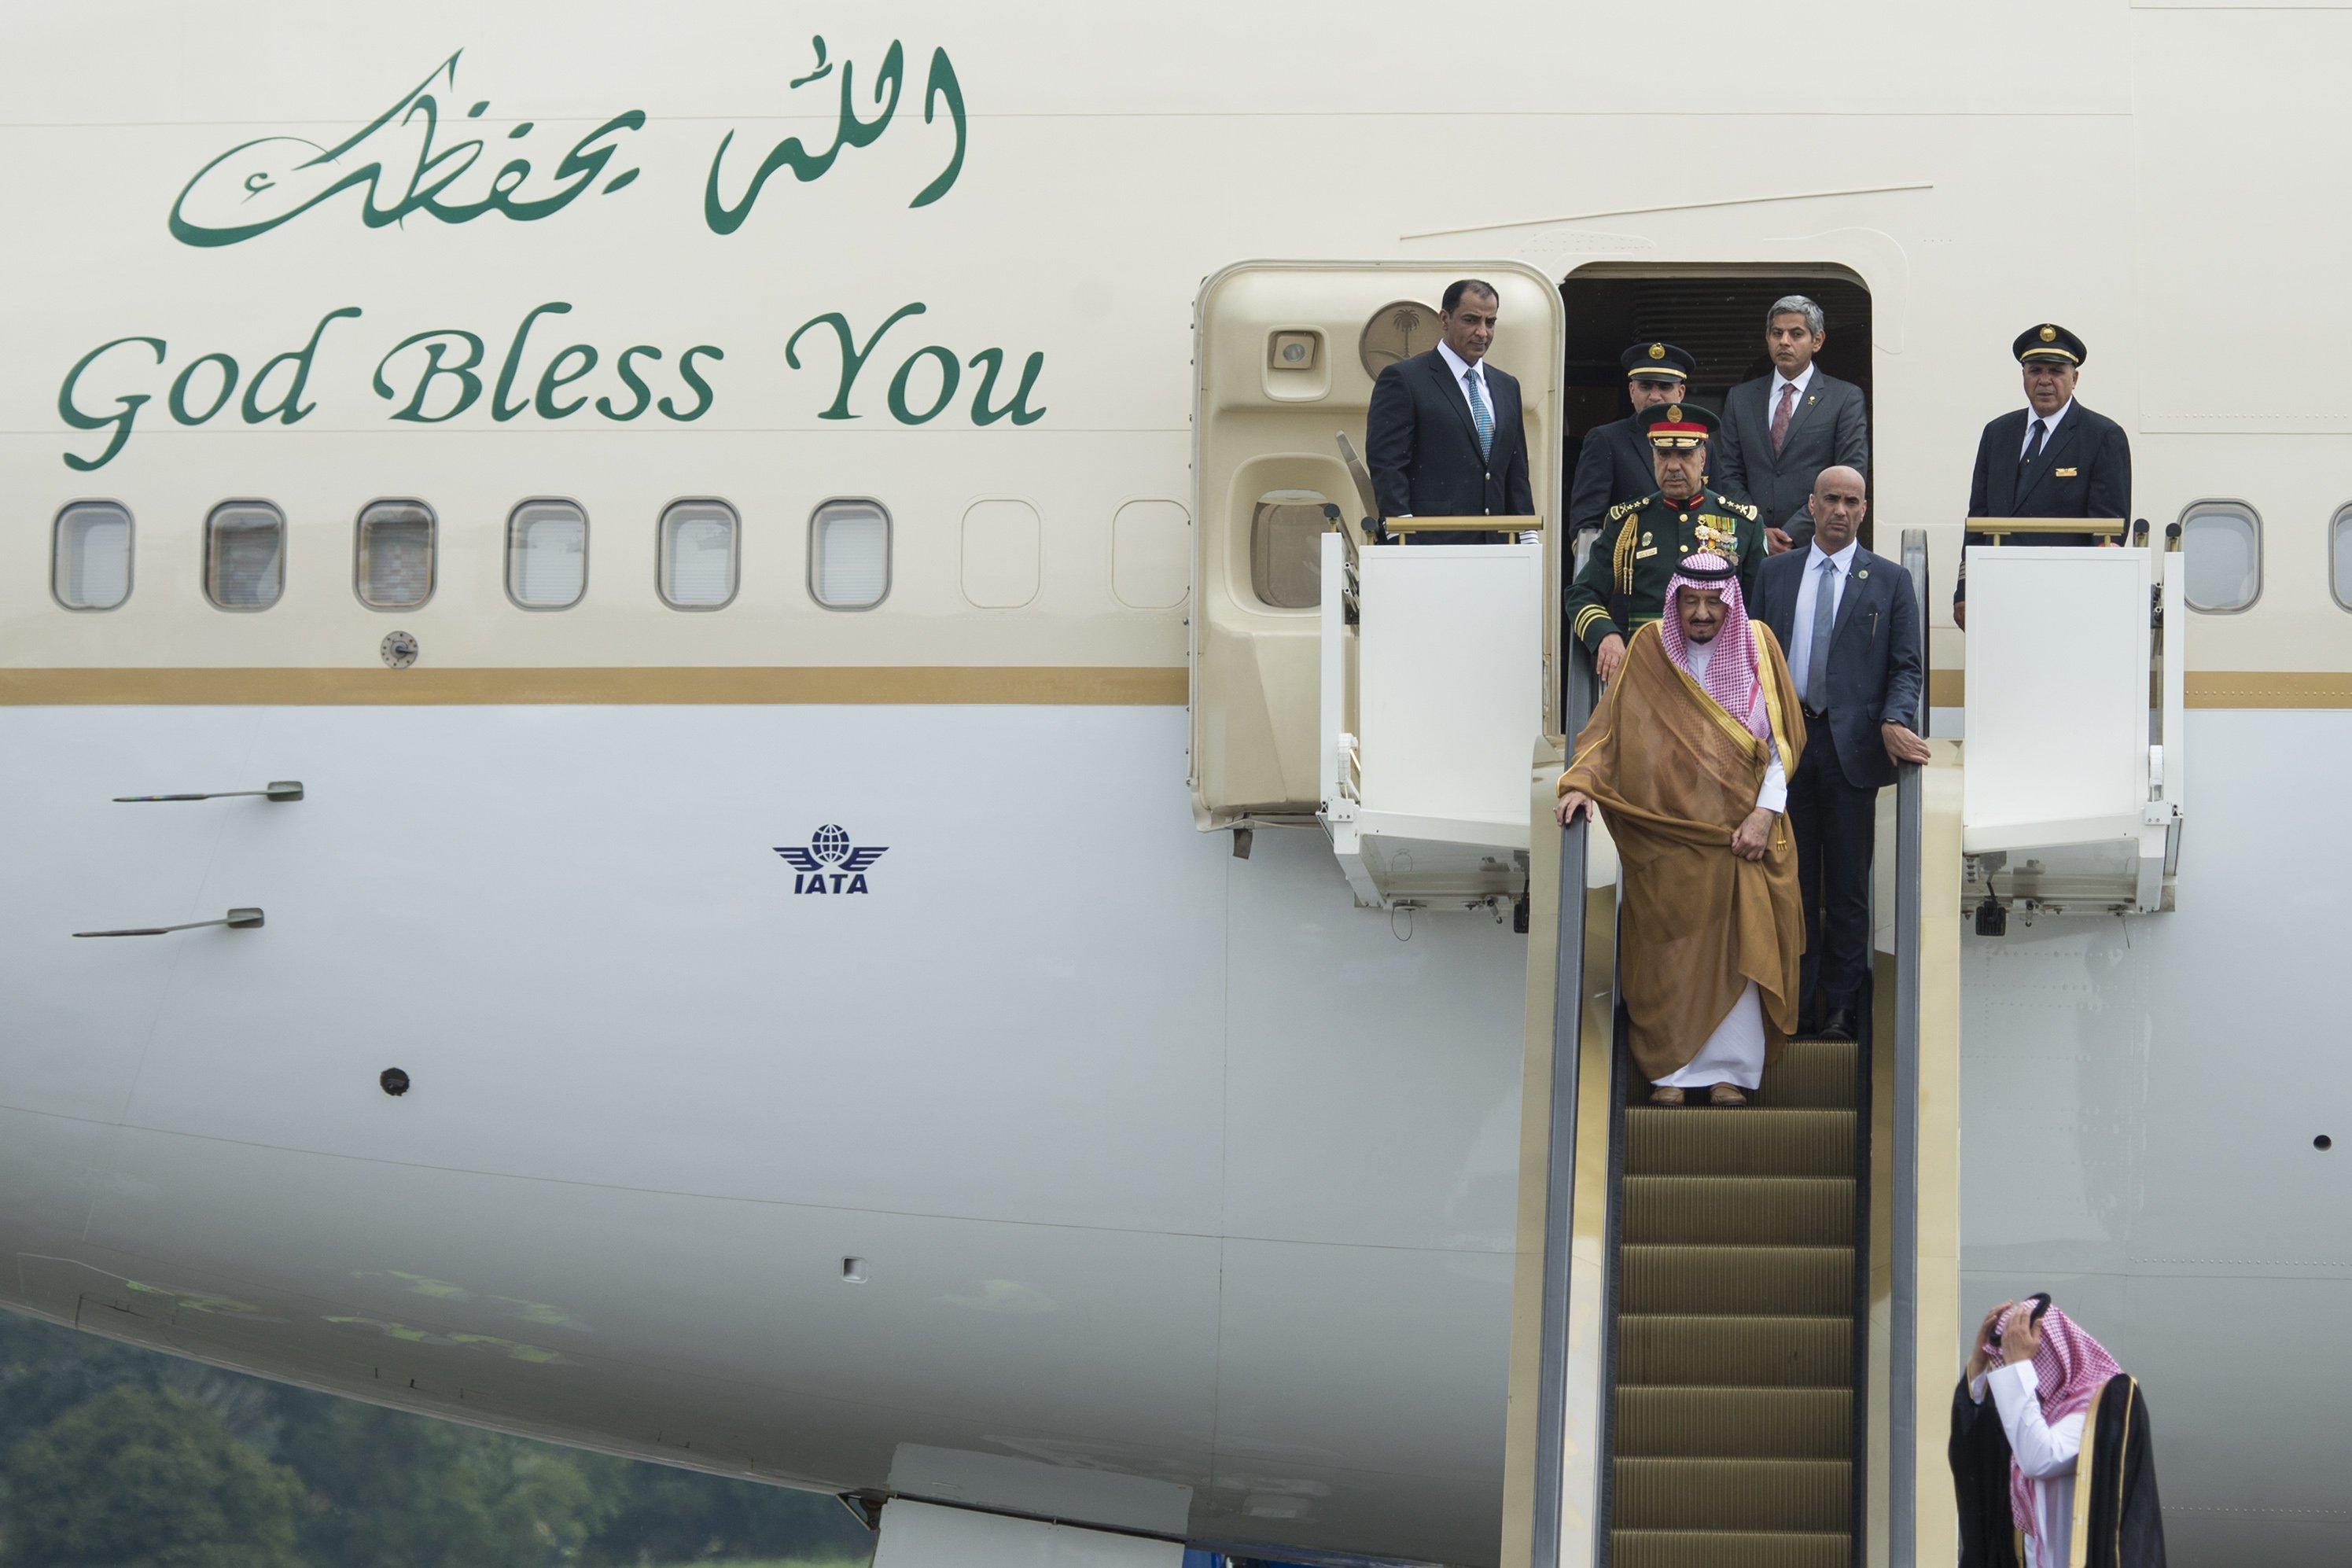 Raja Salman bin Abdulaziz Al-Saud dari Arab Saudi (tengah) tiba di Bandara Halim Perdanakusuma, Jakarta, Rabu (1/3). Kunjungan kenegaraan Raja Salman pada 1-9 Maret ke Indonesia diharapkan menjadi momentum untuk mendorong investasi dari Timur Tengah.